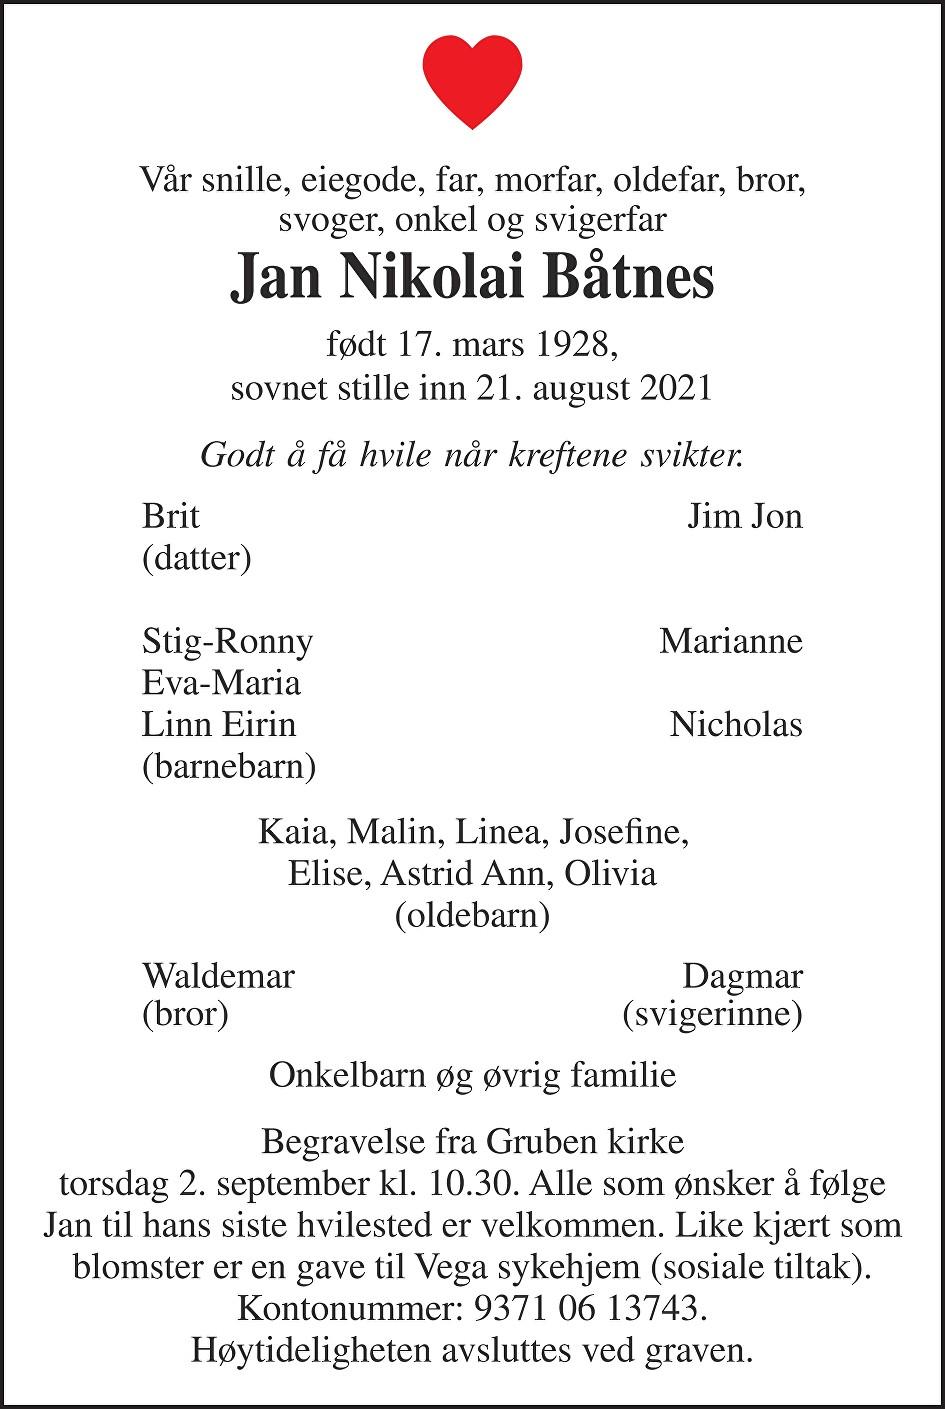 Jan Nikolai Båtnes Dødsannonse